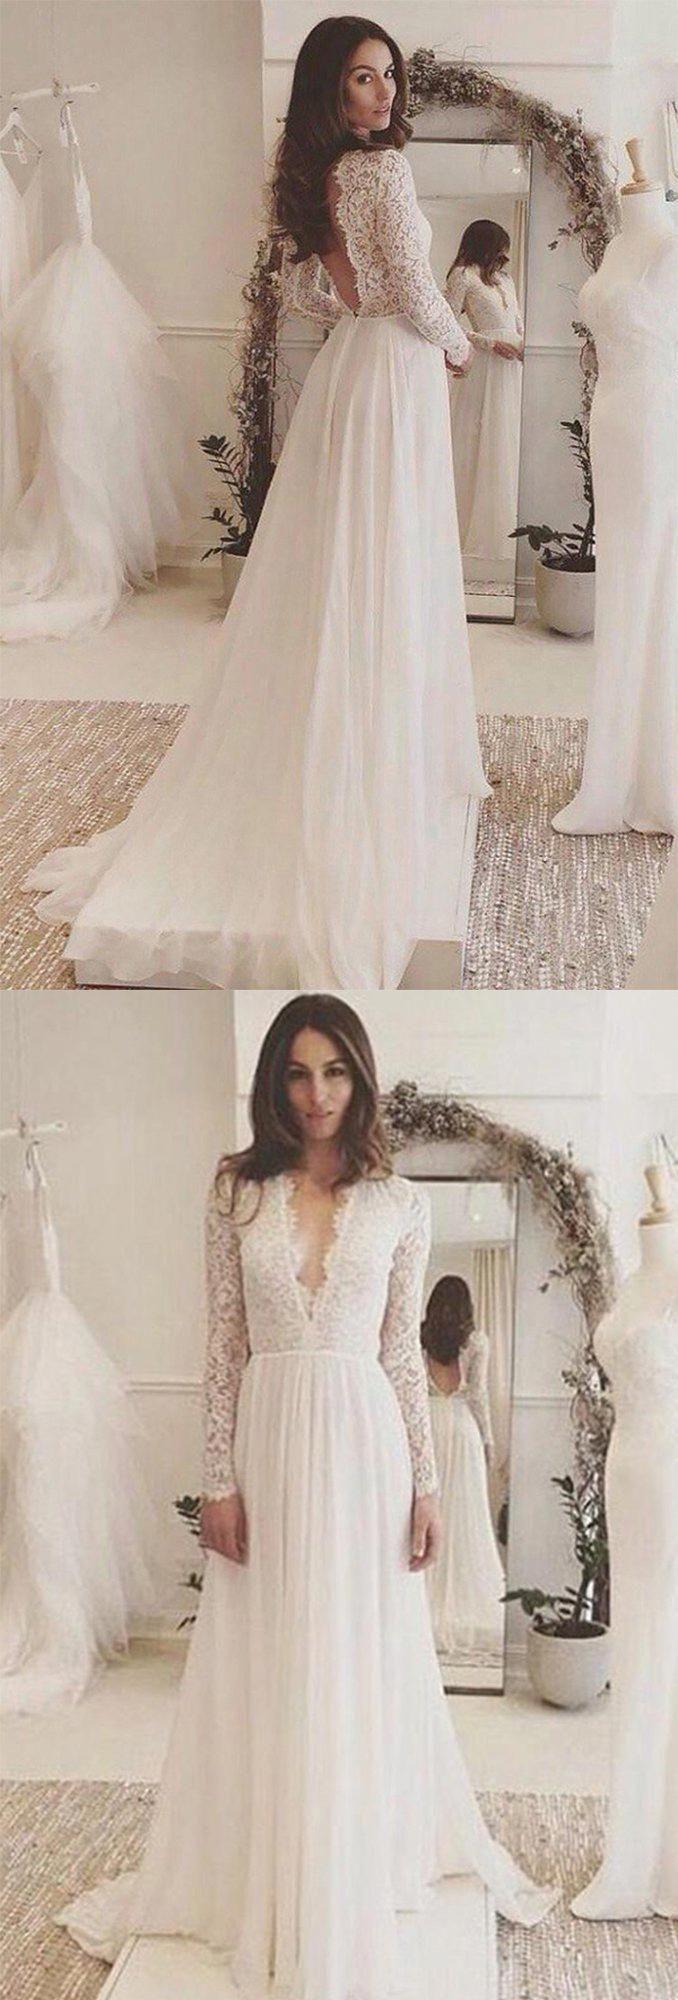 Wedding Dresses Torrance Wedding In 2019 Pinterest Wedding